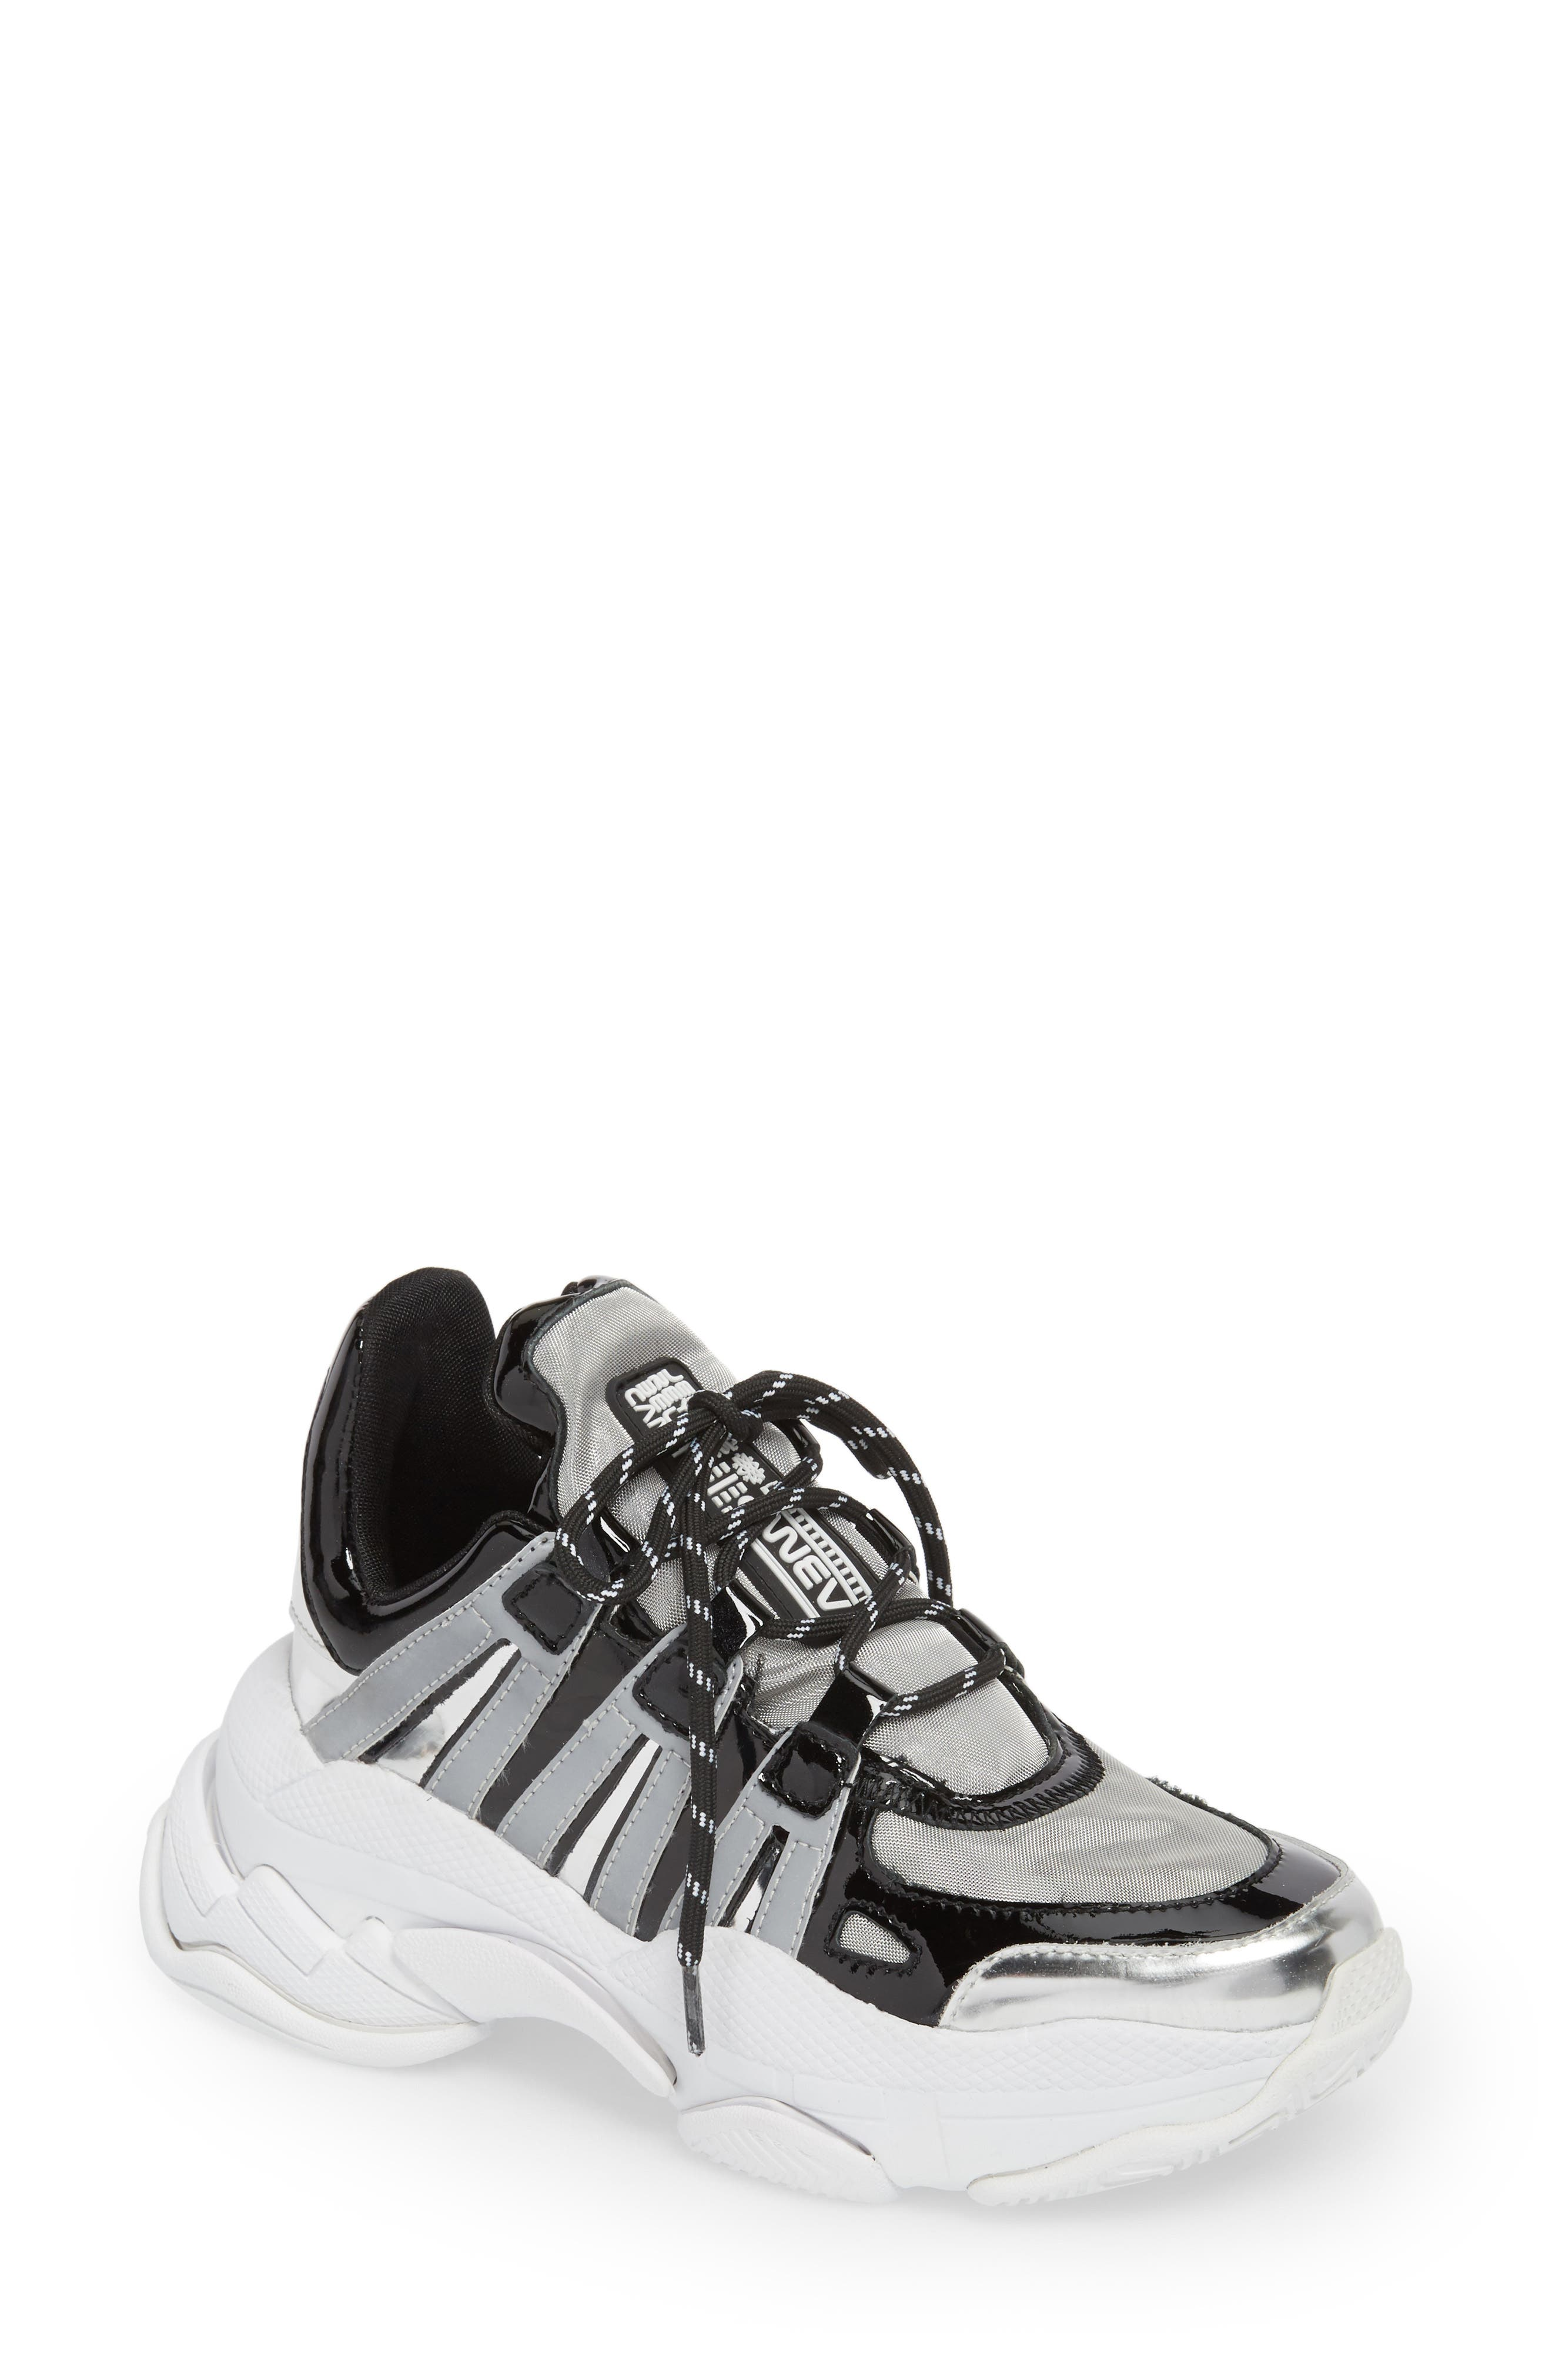 WiFi Sneaker,                             Main thumbnail 1, color,                             048